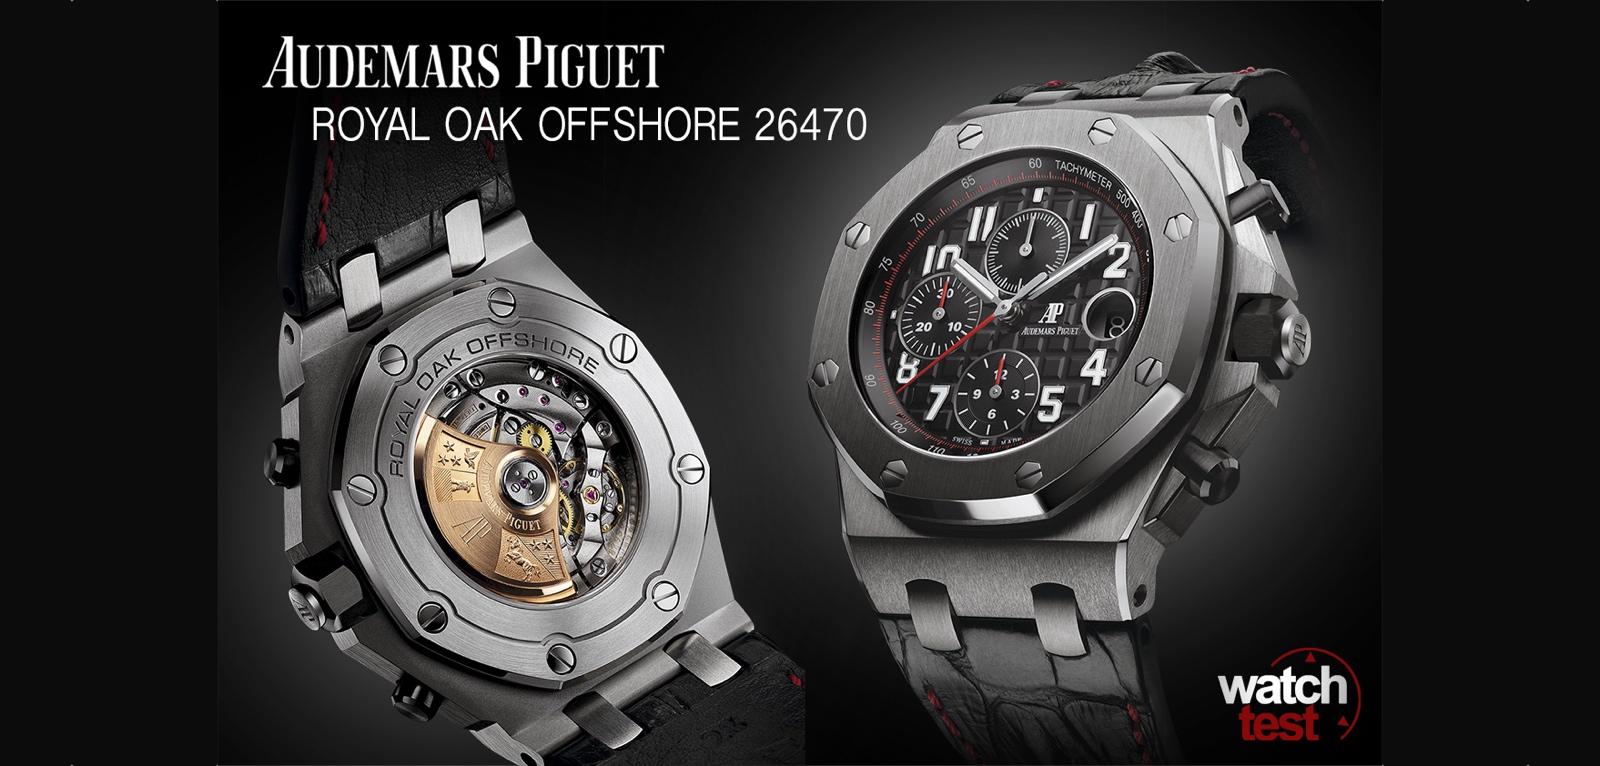 Royal Oak Offshore 26470